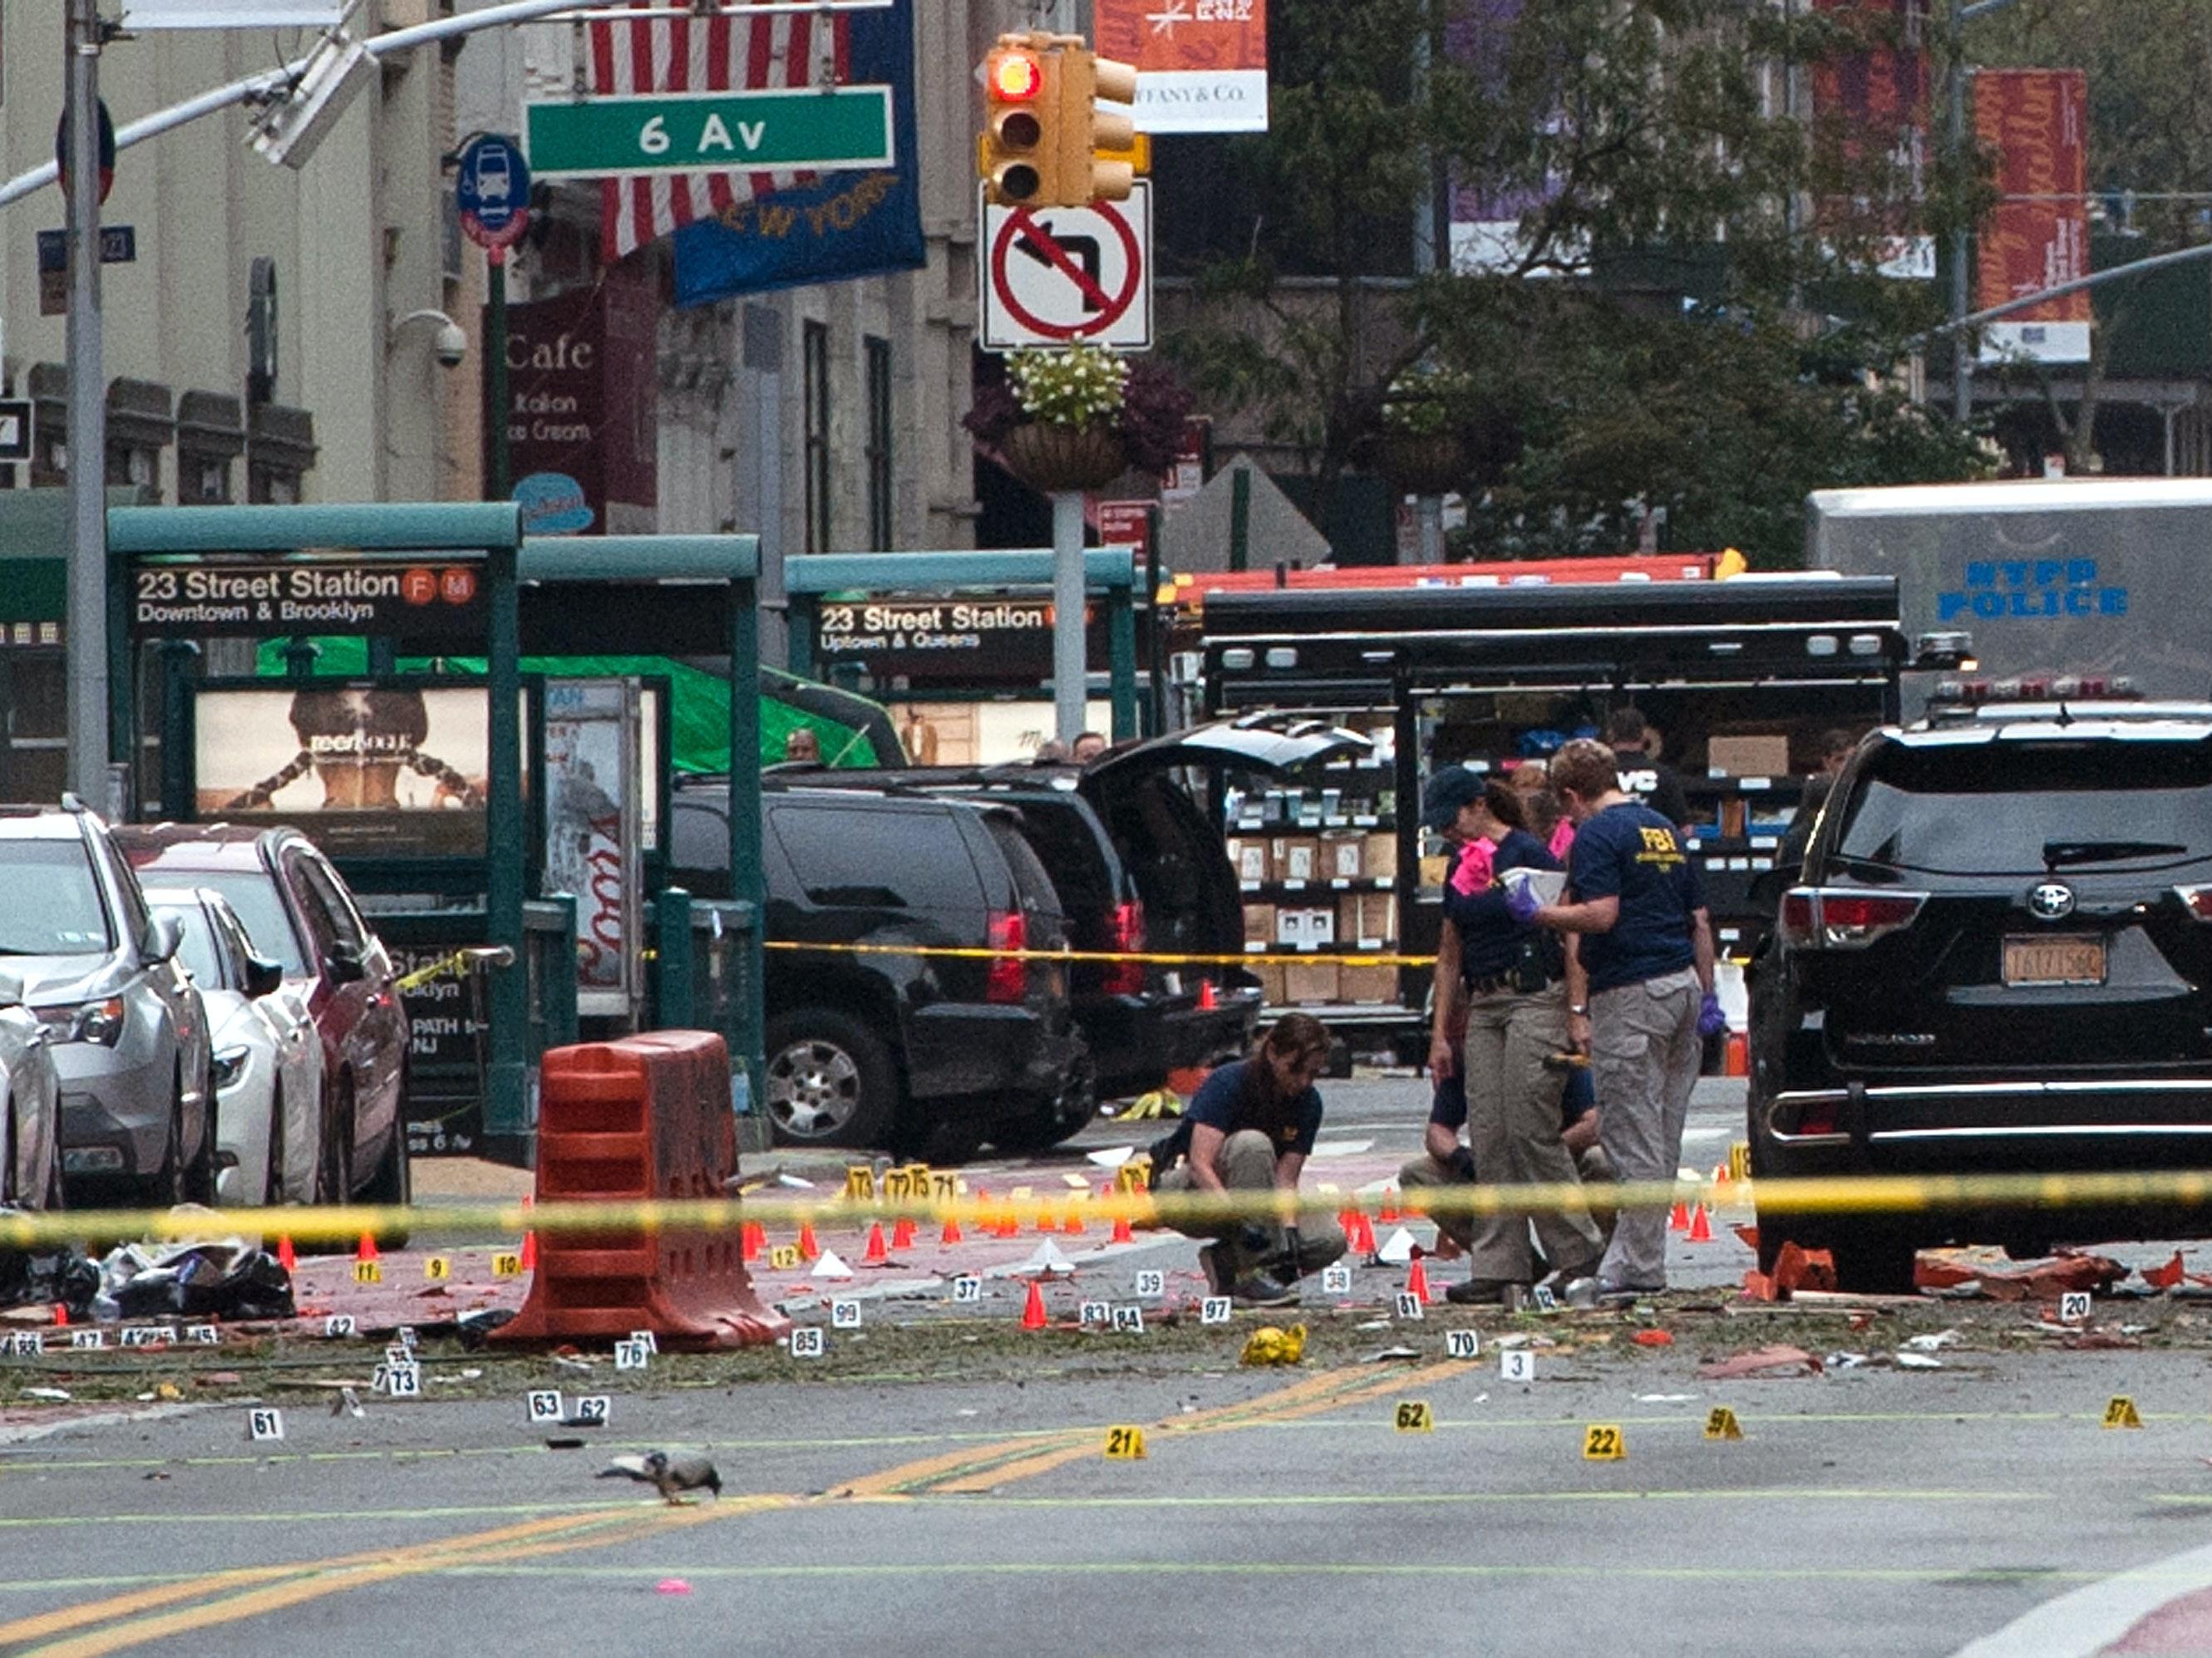 FBI agents review the crime scene of remnants of bomb debris on 23rd St. in Manhattan's Chelsea neighborhood on September 18, 2016 in New York City.